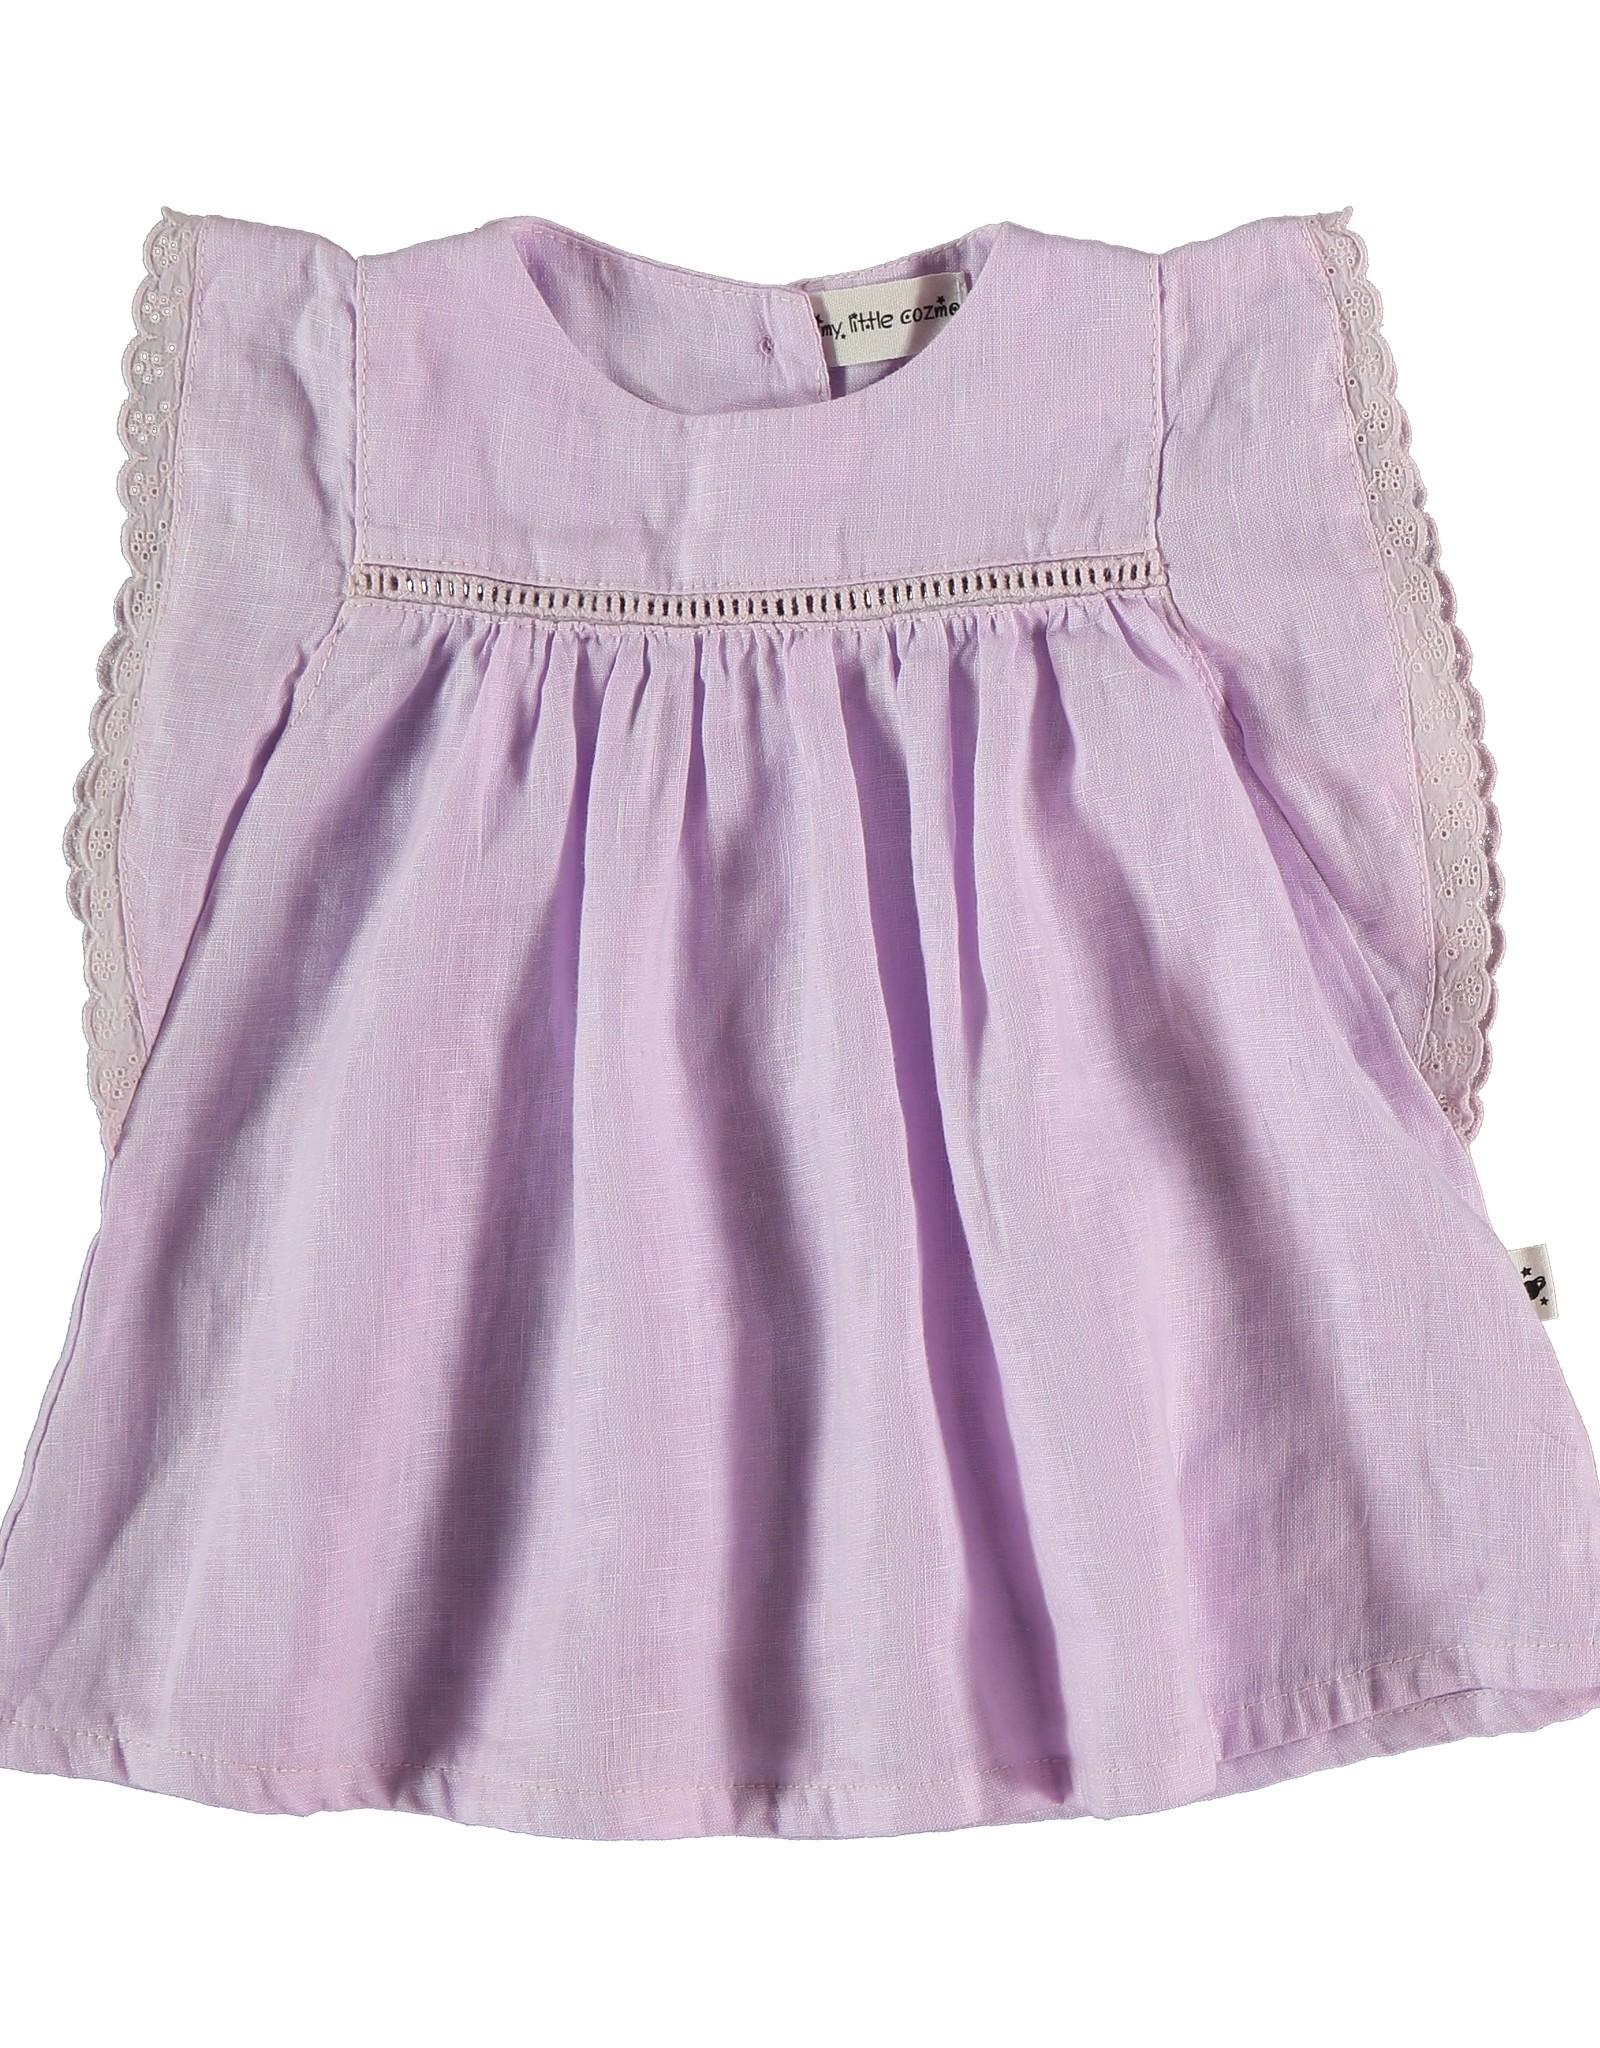 My Little Cozmo My Little Cozmo Novah Linen Dress